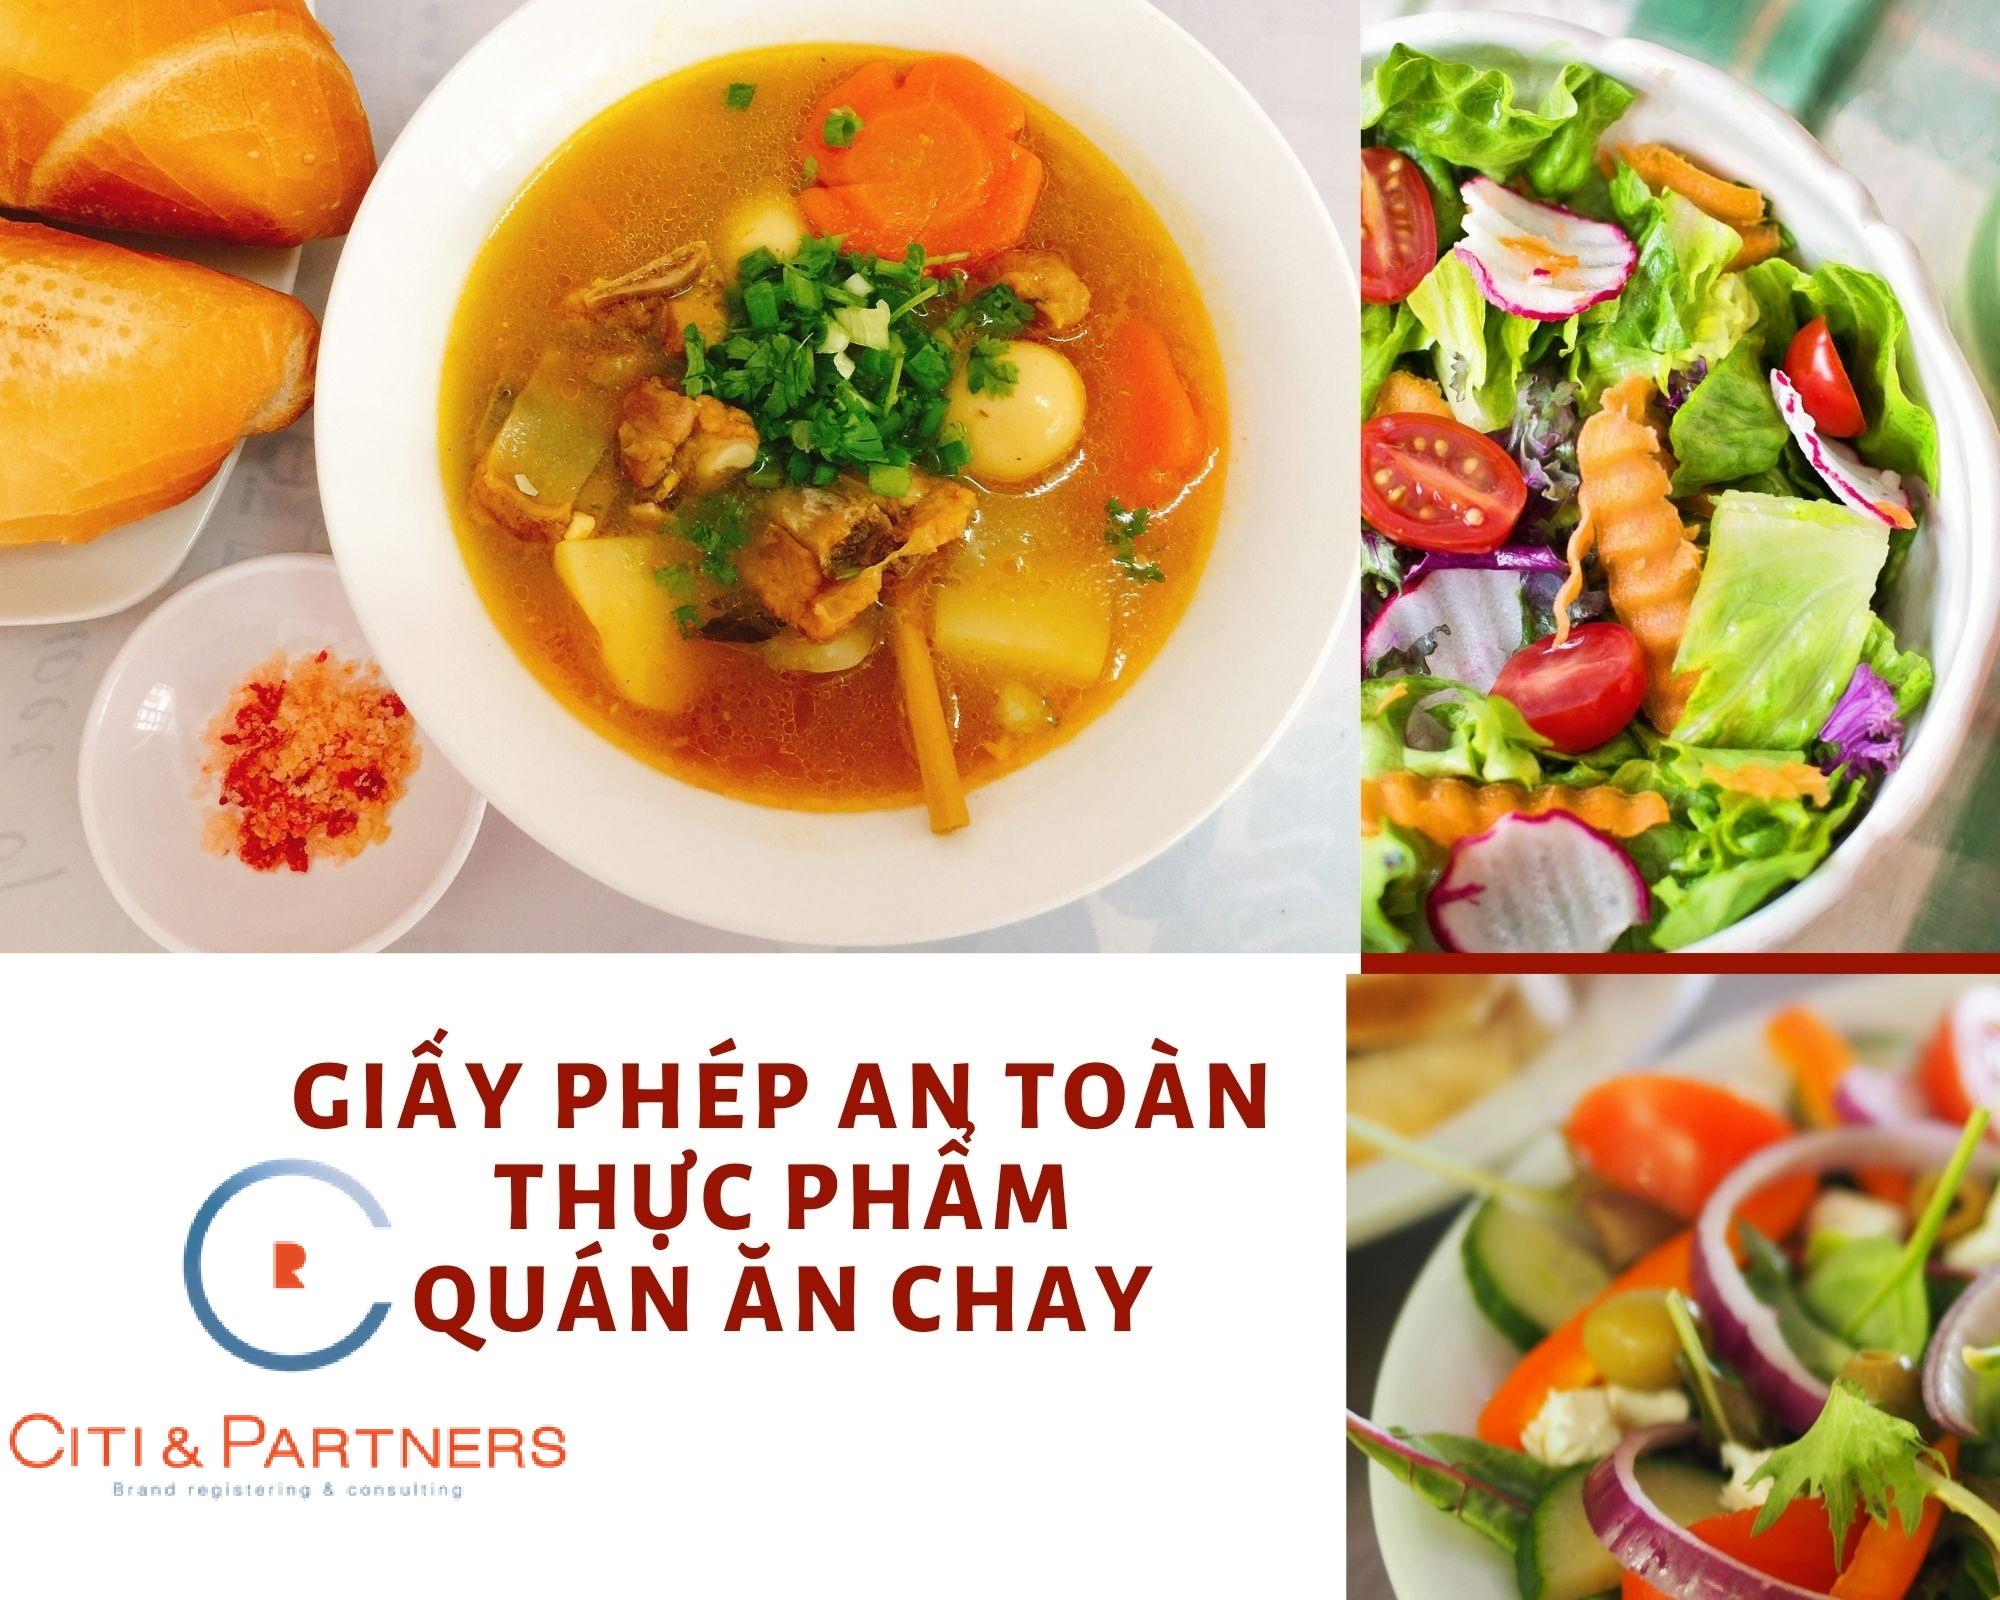 dang-ky-giay-phep-an-toan-thuc-pham-quan-an-chay